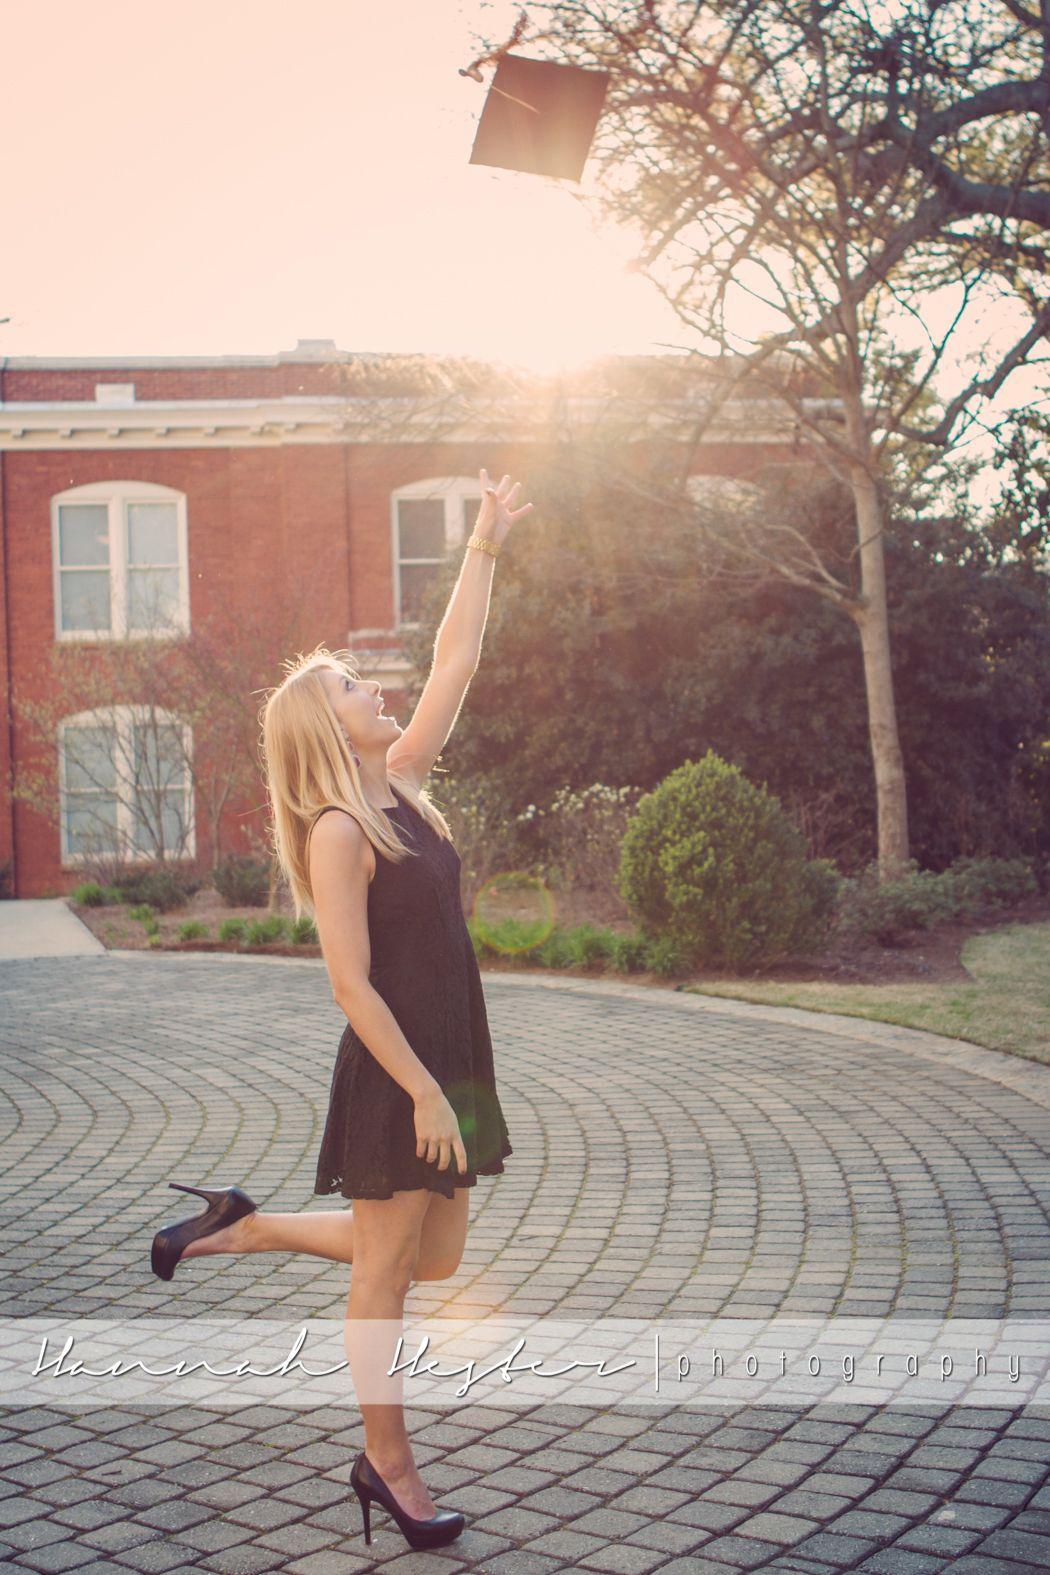 UGA Graduation photo ideas. Toss the cap!